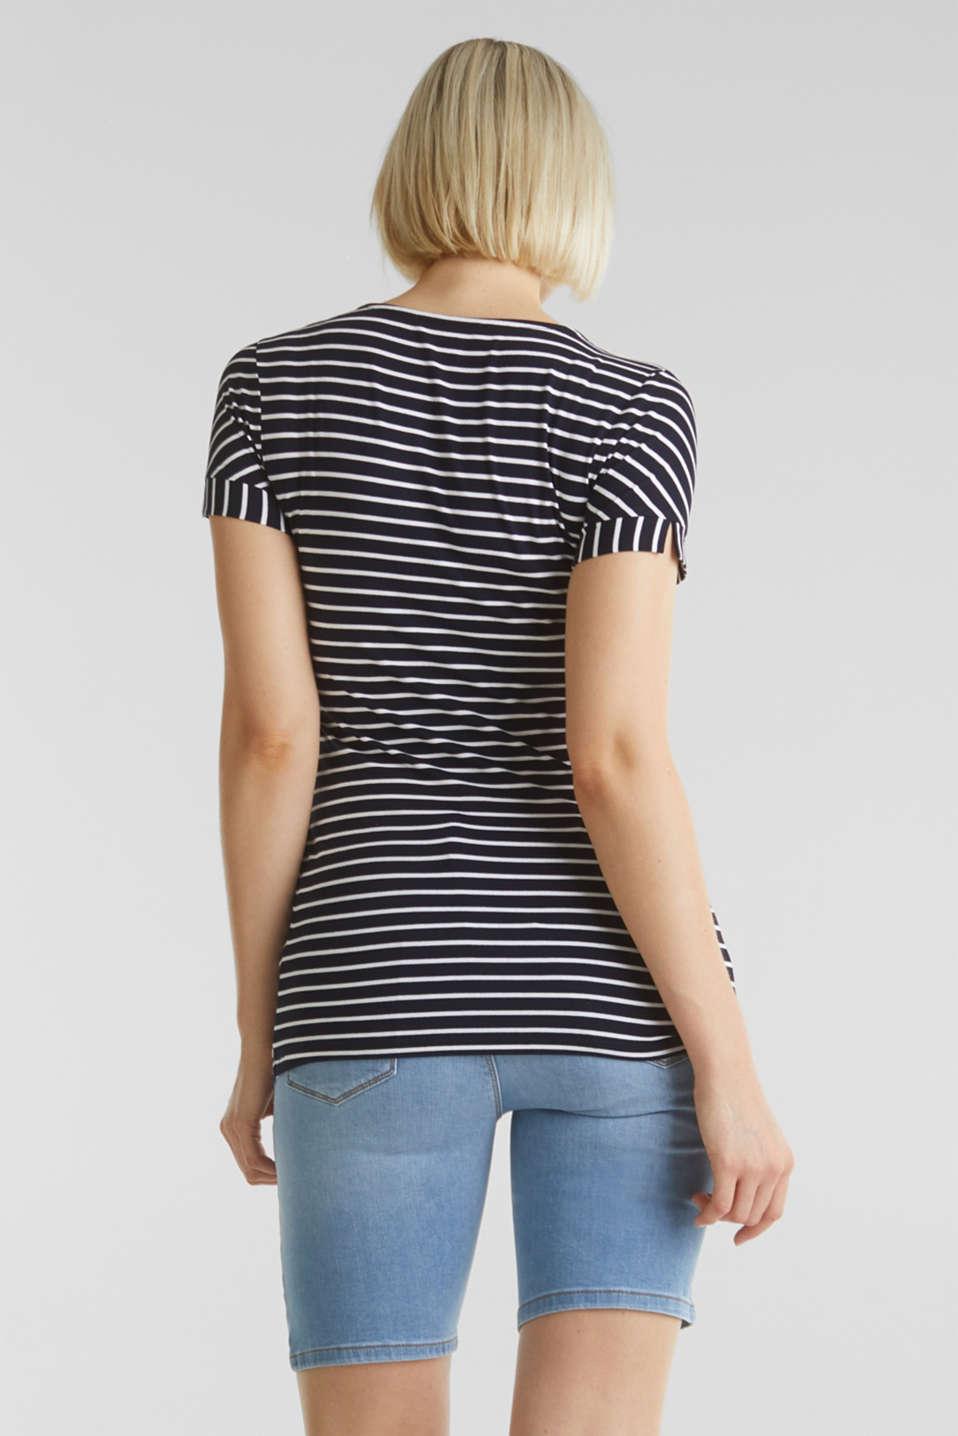 Denim shorts with an under-bump waistband, LCLIGHTWASH, detail image number 3